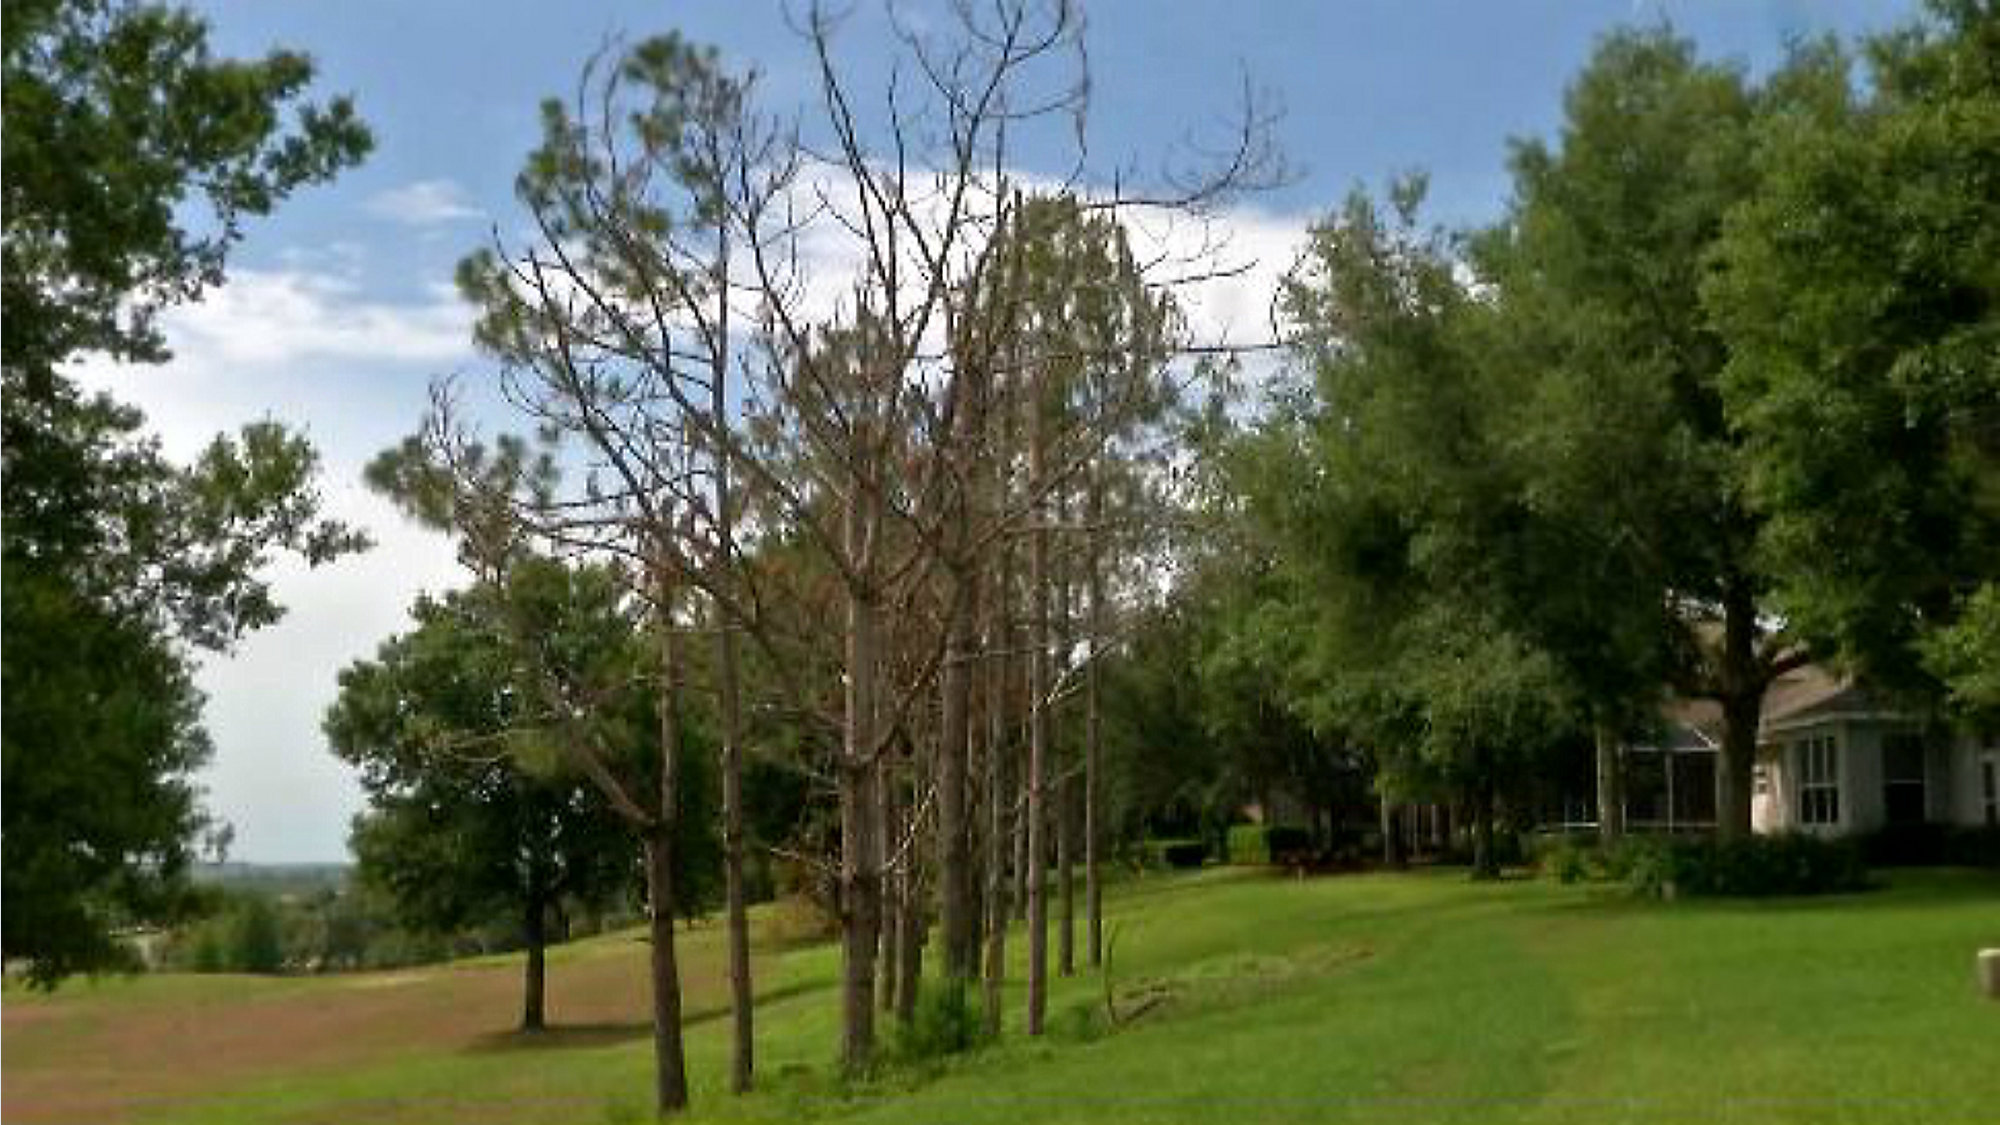 Lake County | Orlando Florida Local News | Spectrum News 13